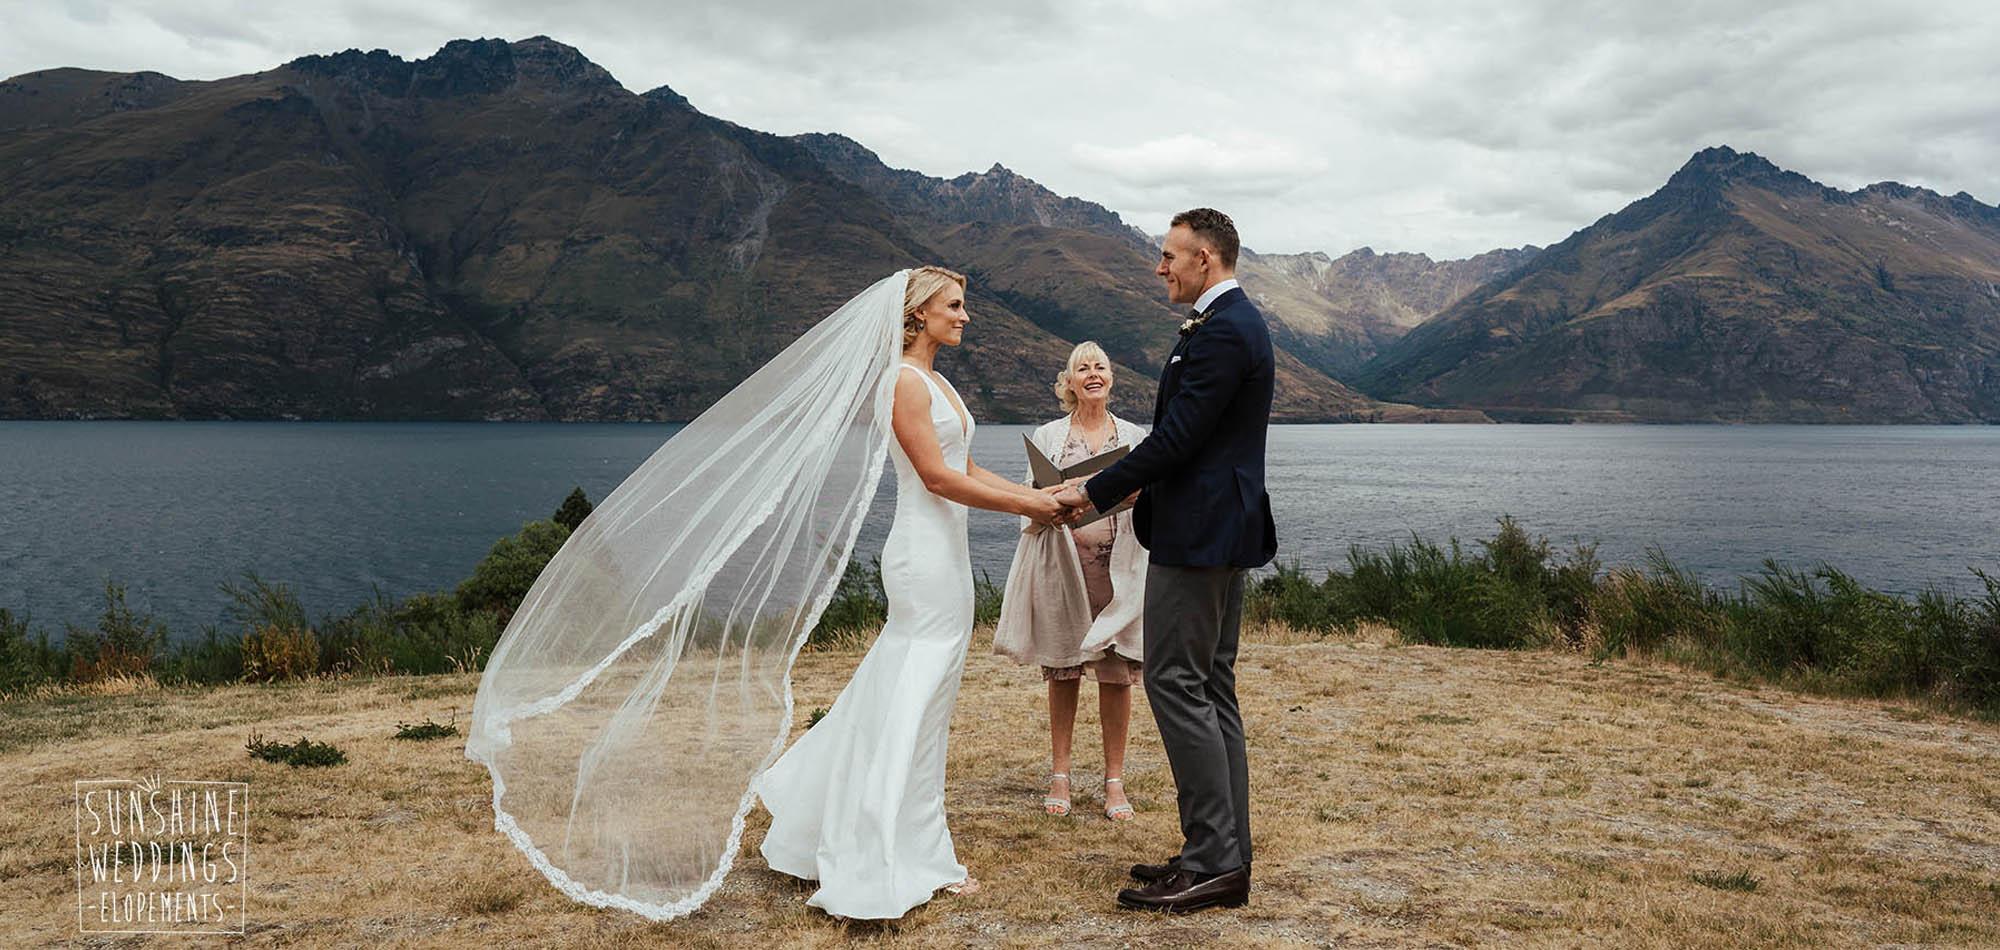 wedding lake wakatipu, lakeside elopement wedding, Queenstown ceremony location